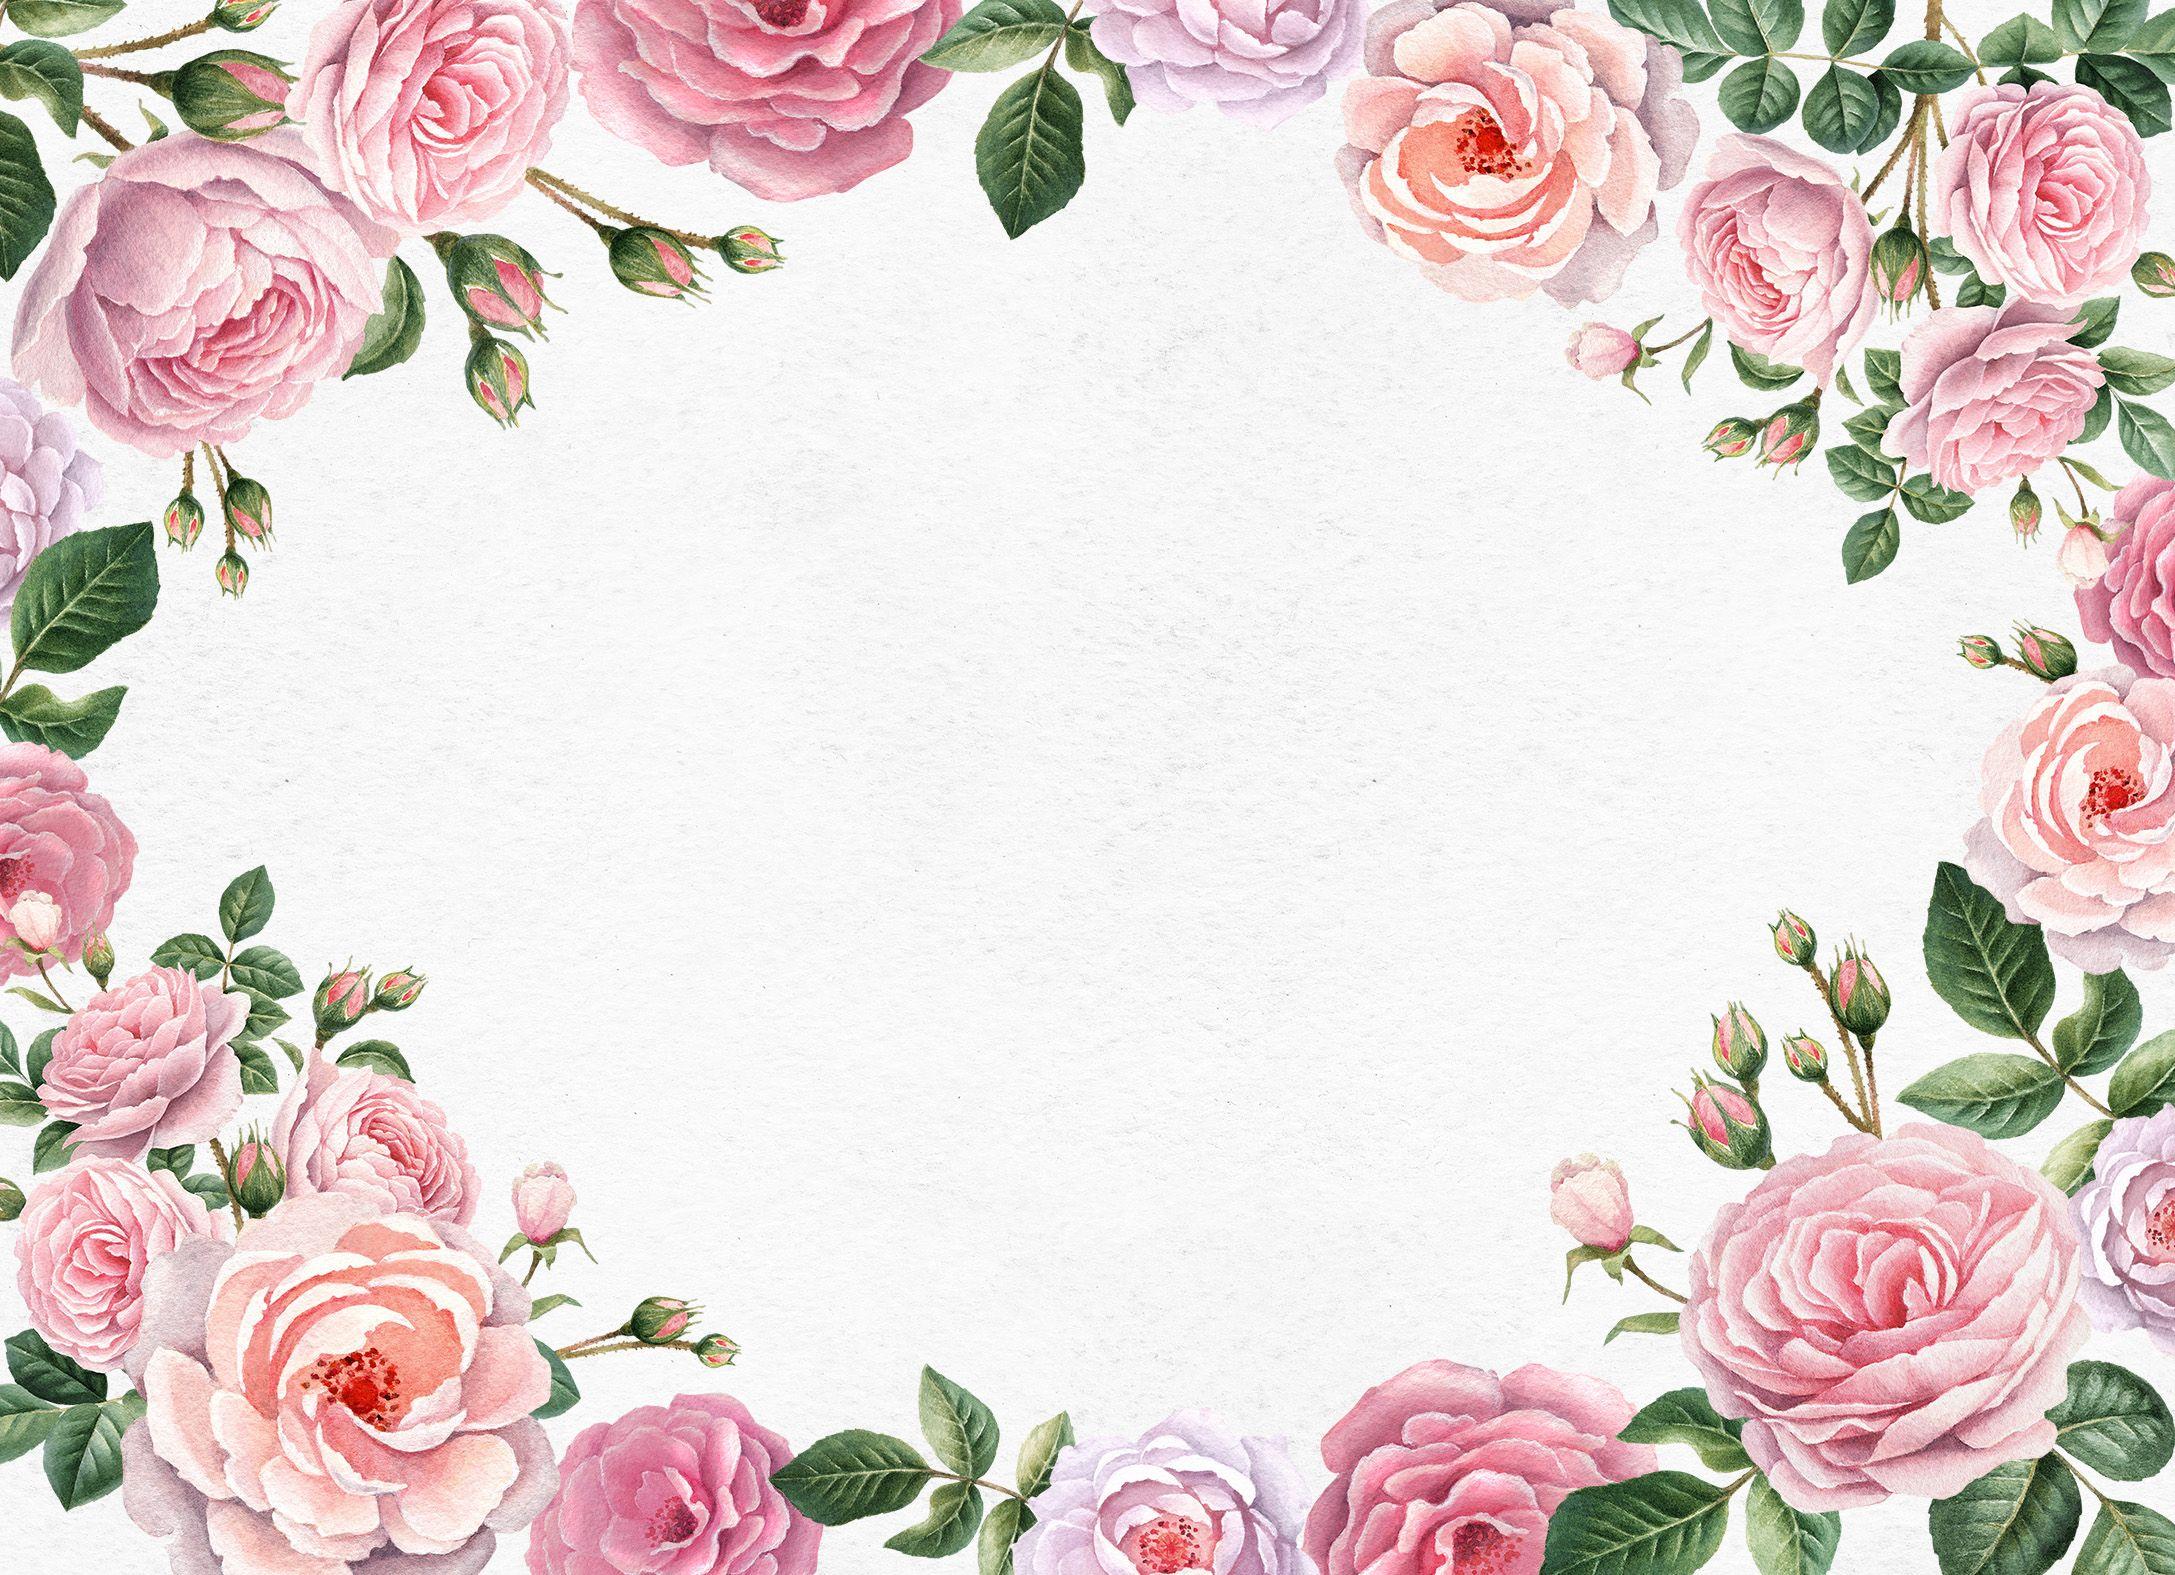 Free Online Wedding Invitation Creator   Jukeboxprint.com